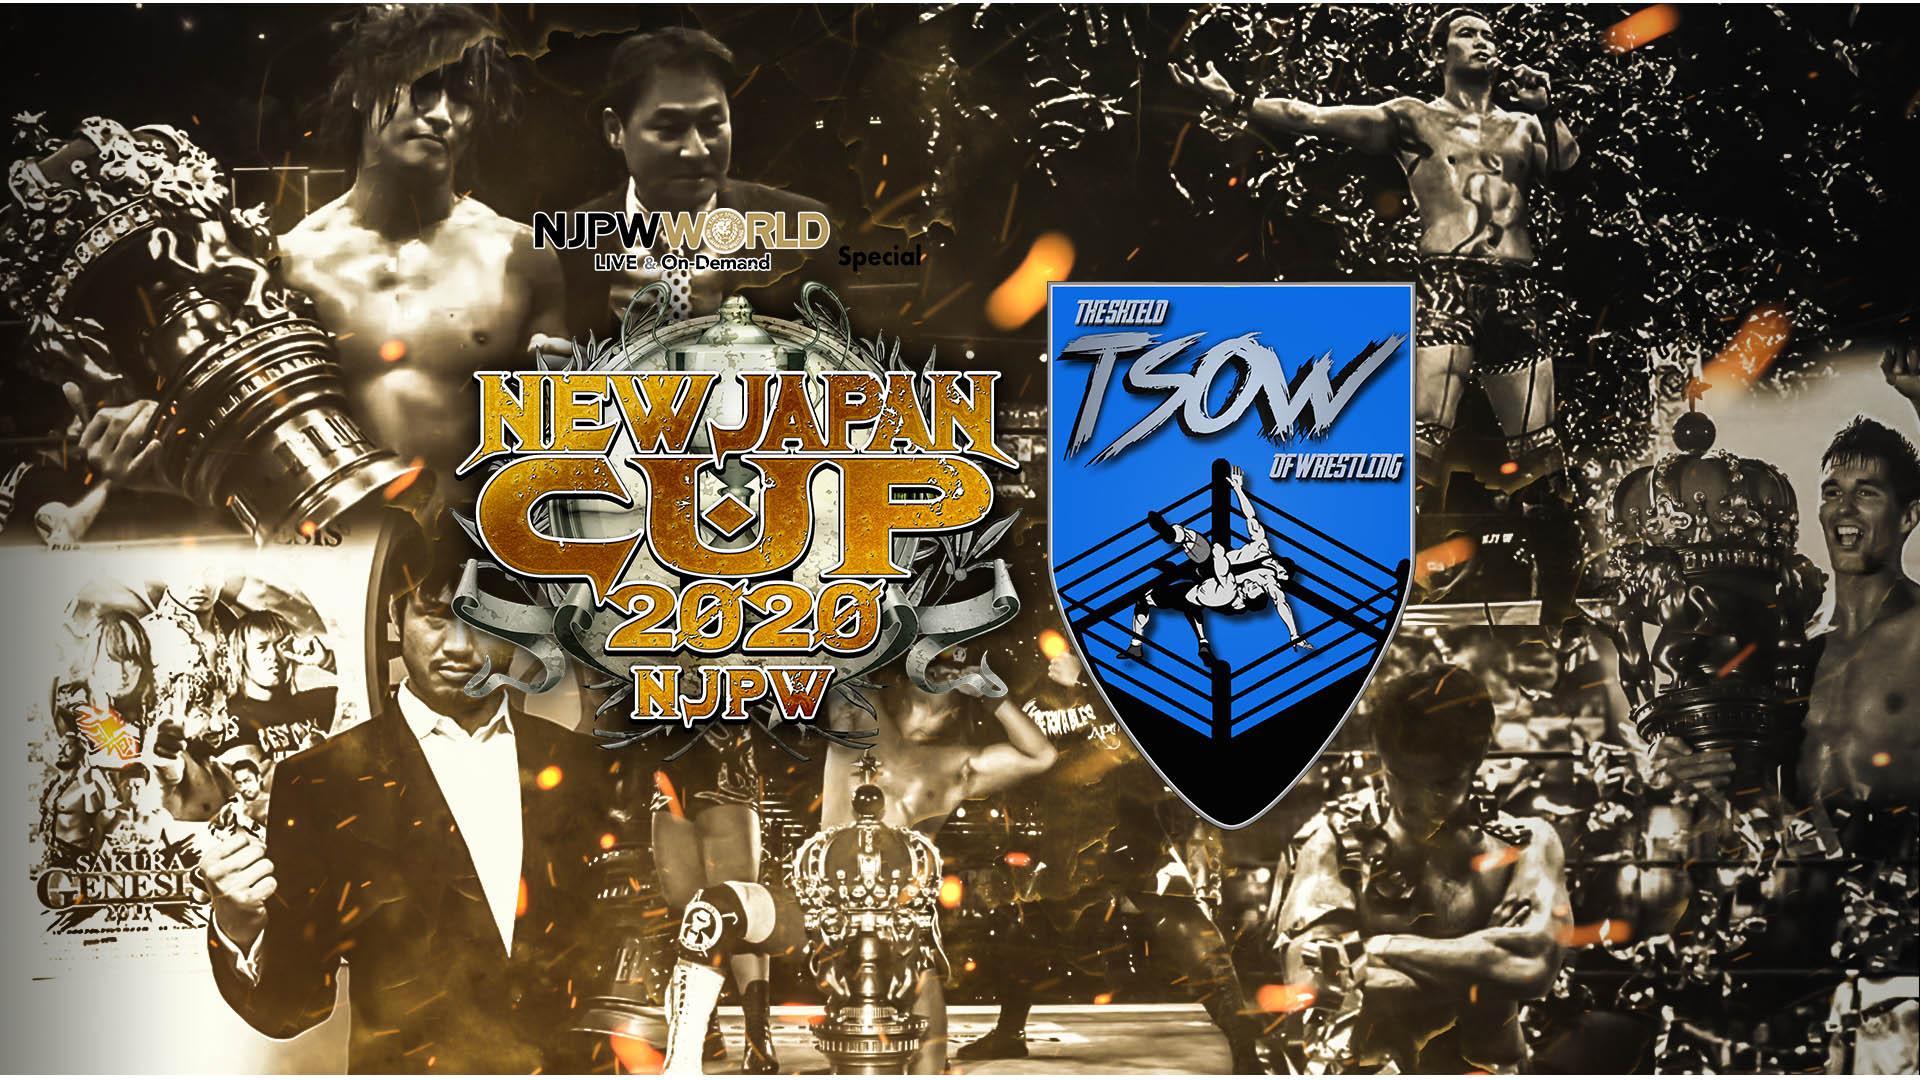 Risultati NJPW NEW JAPAN CUP 2020 Night 5